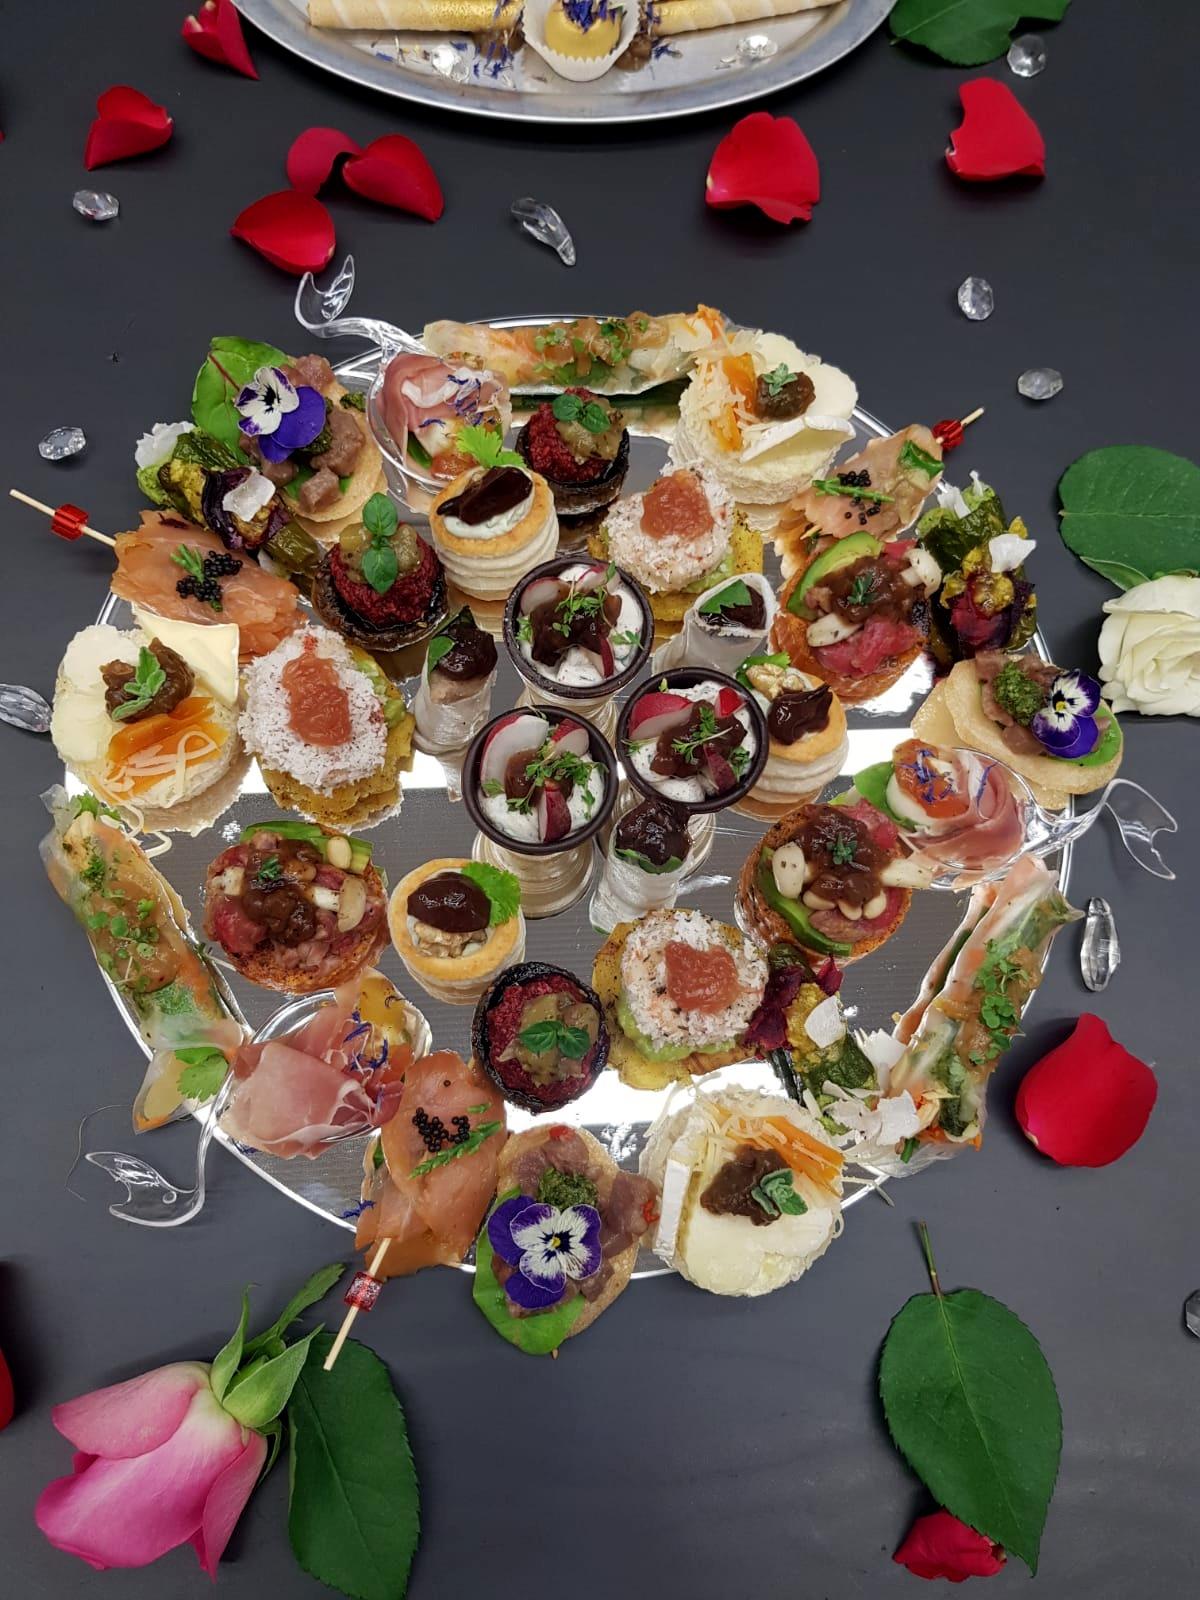 Petra Kargl le moi moii Adventures Catering & Webshop